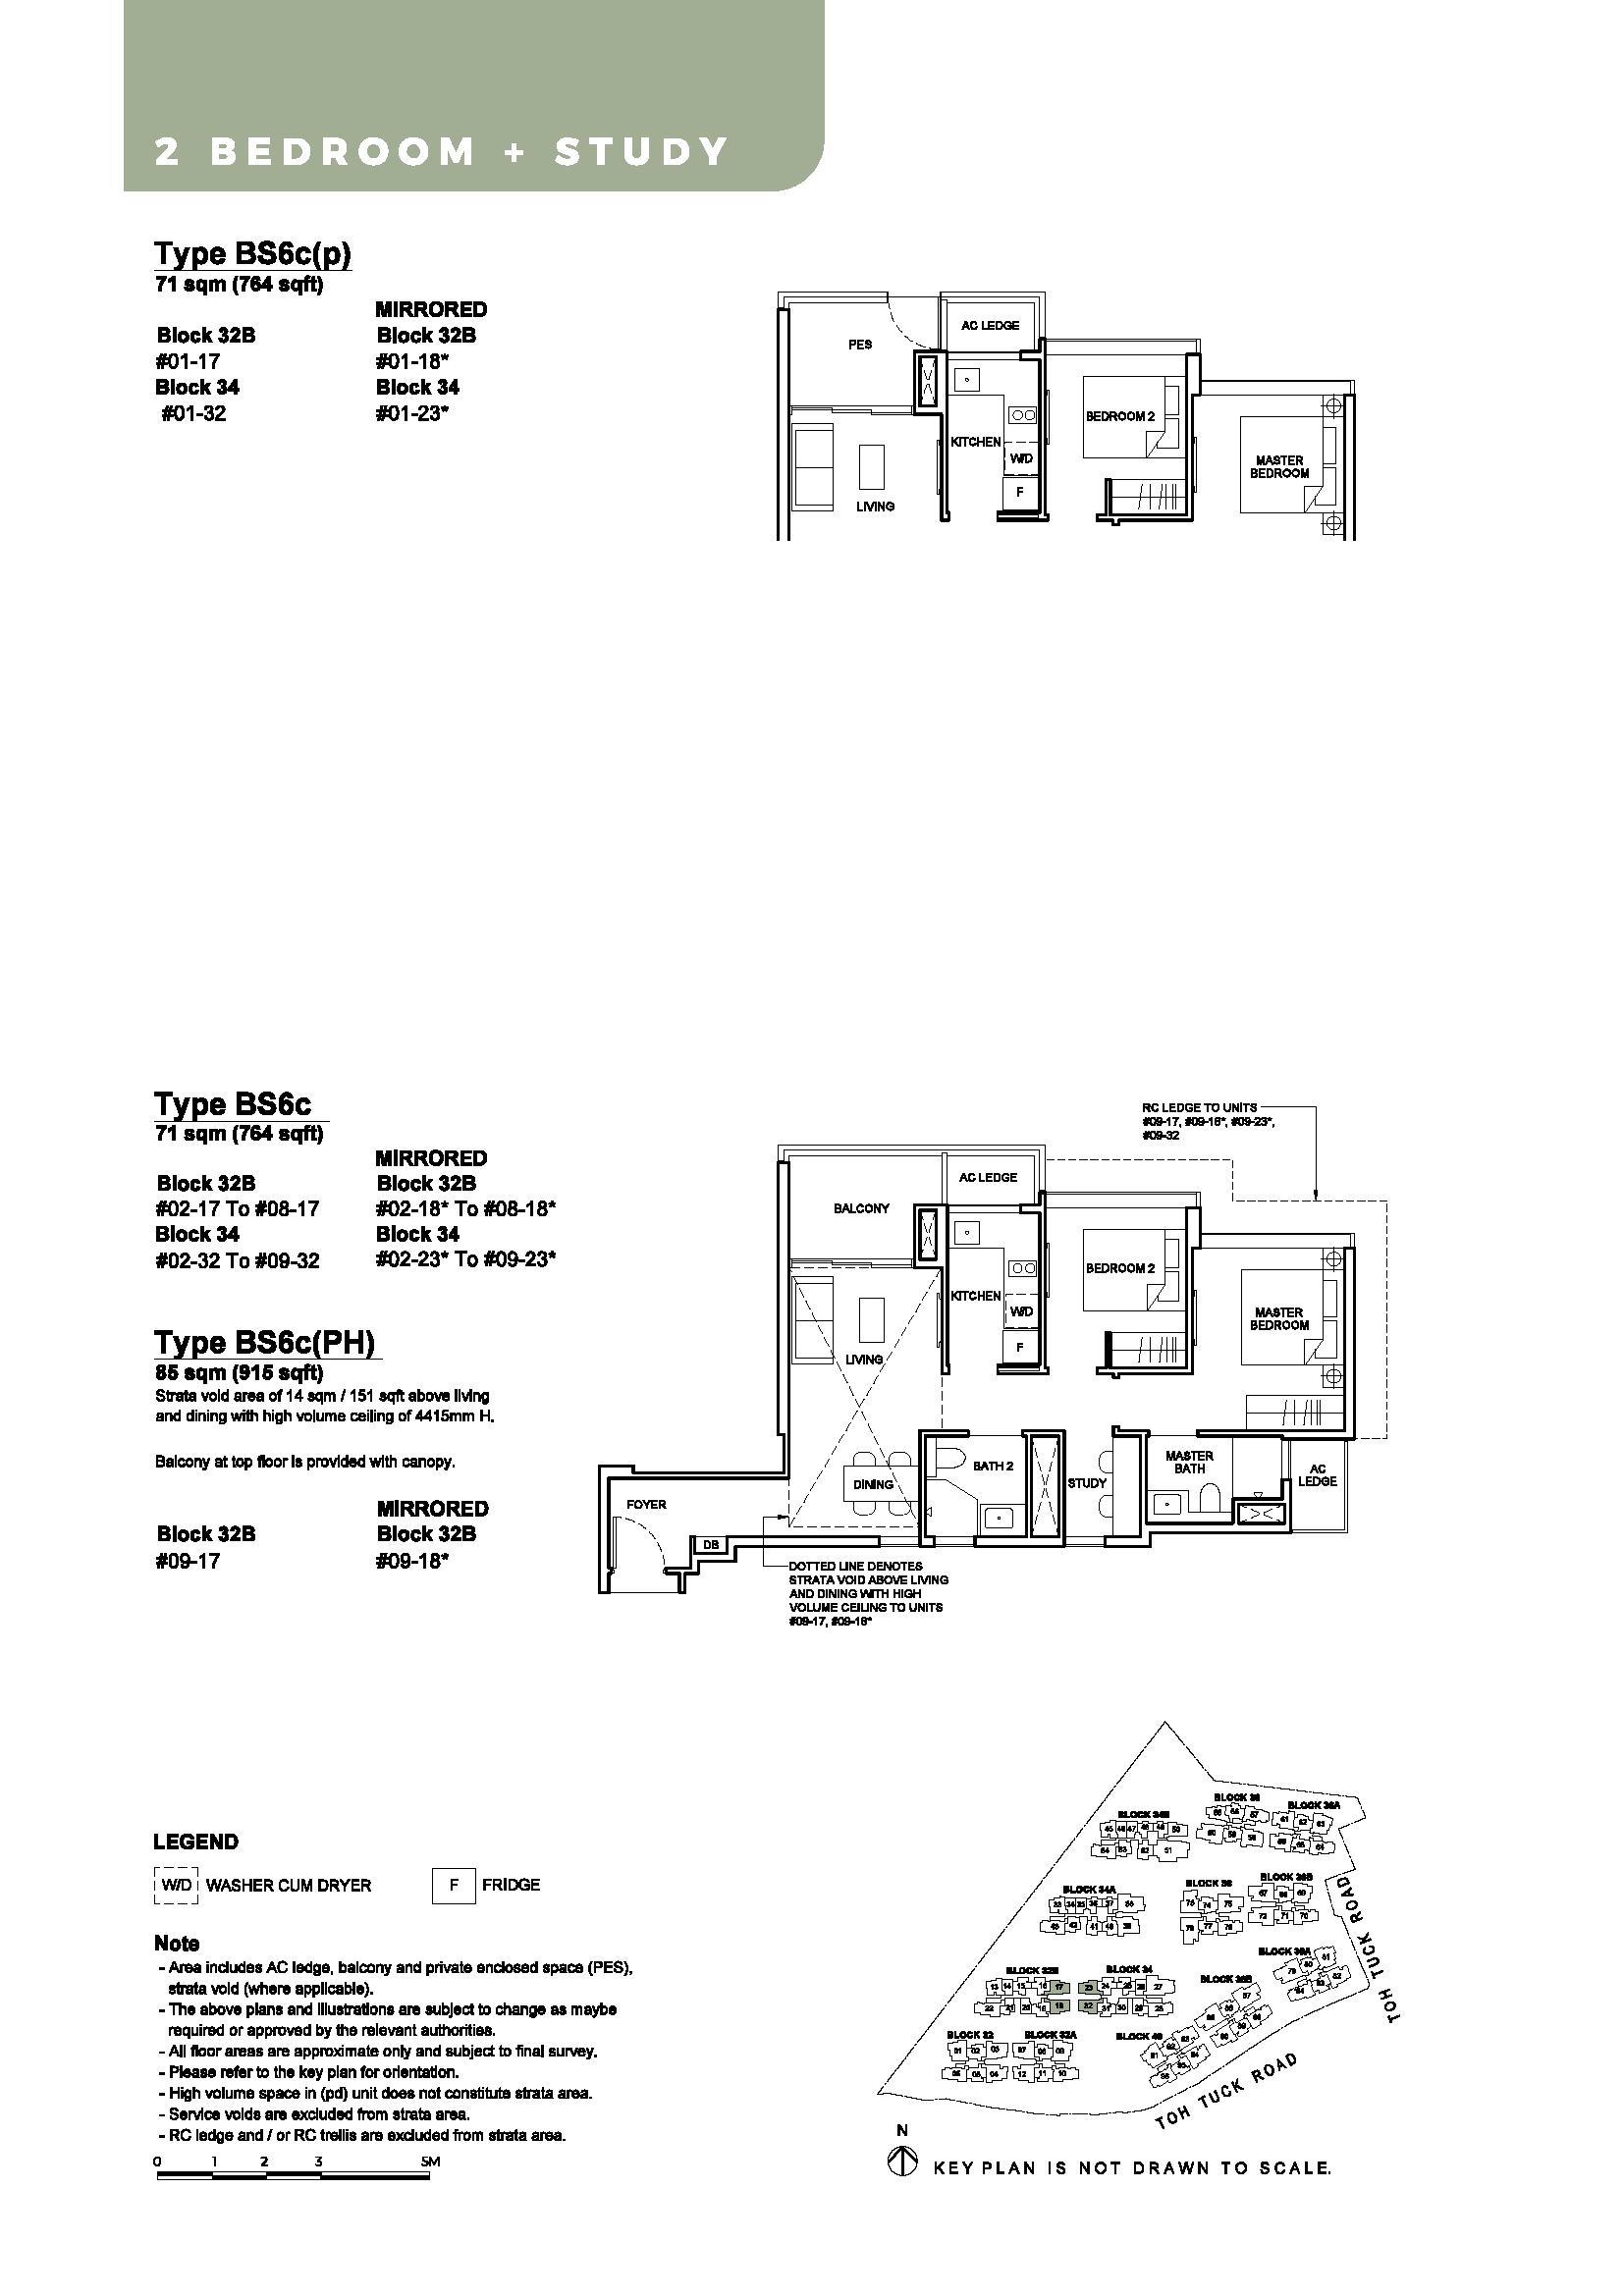 Type BS6c, BS6c(p), BS6b(PH)